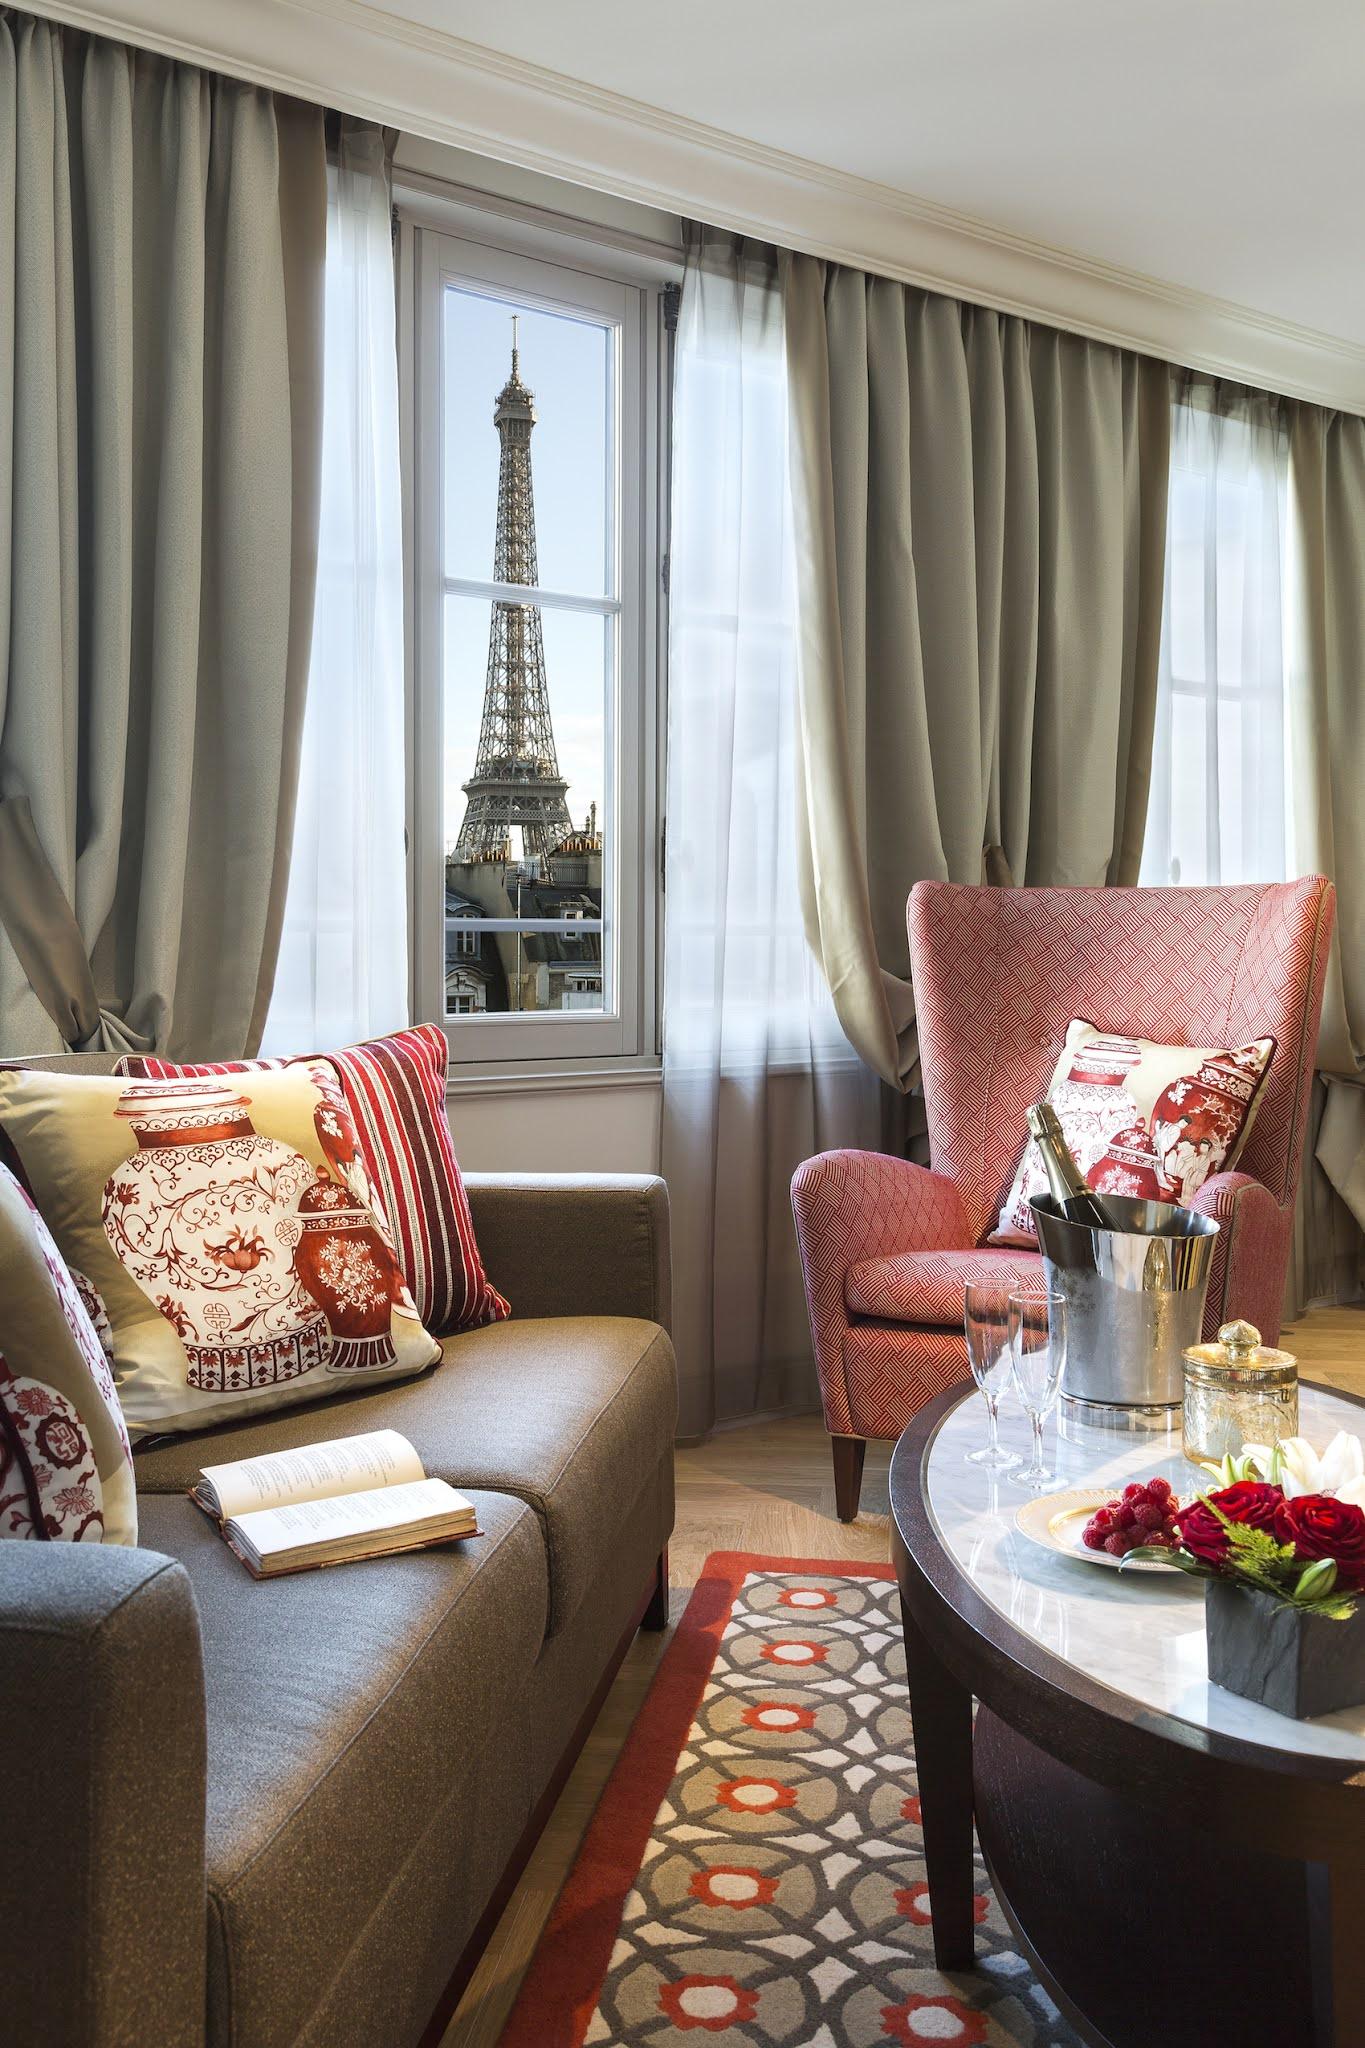 Hotel La Clef Tour Eiffel